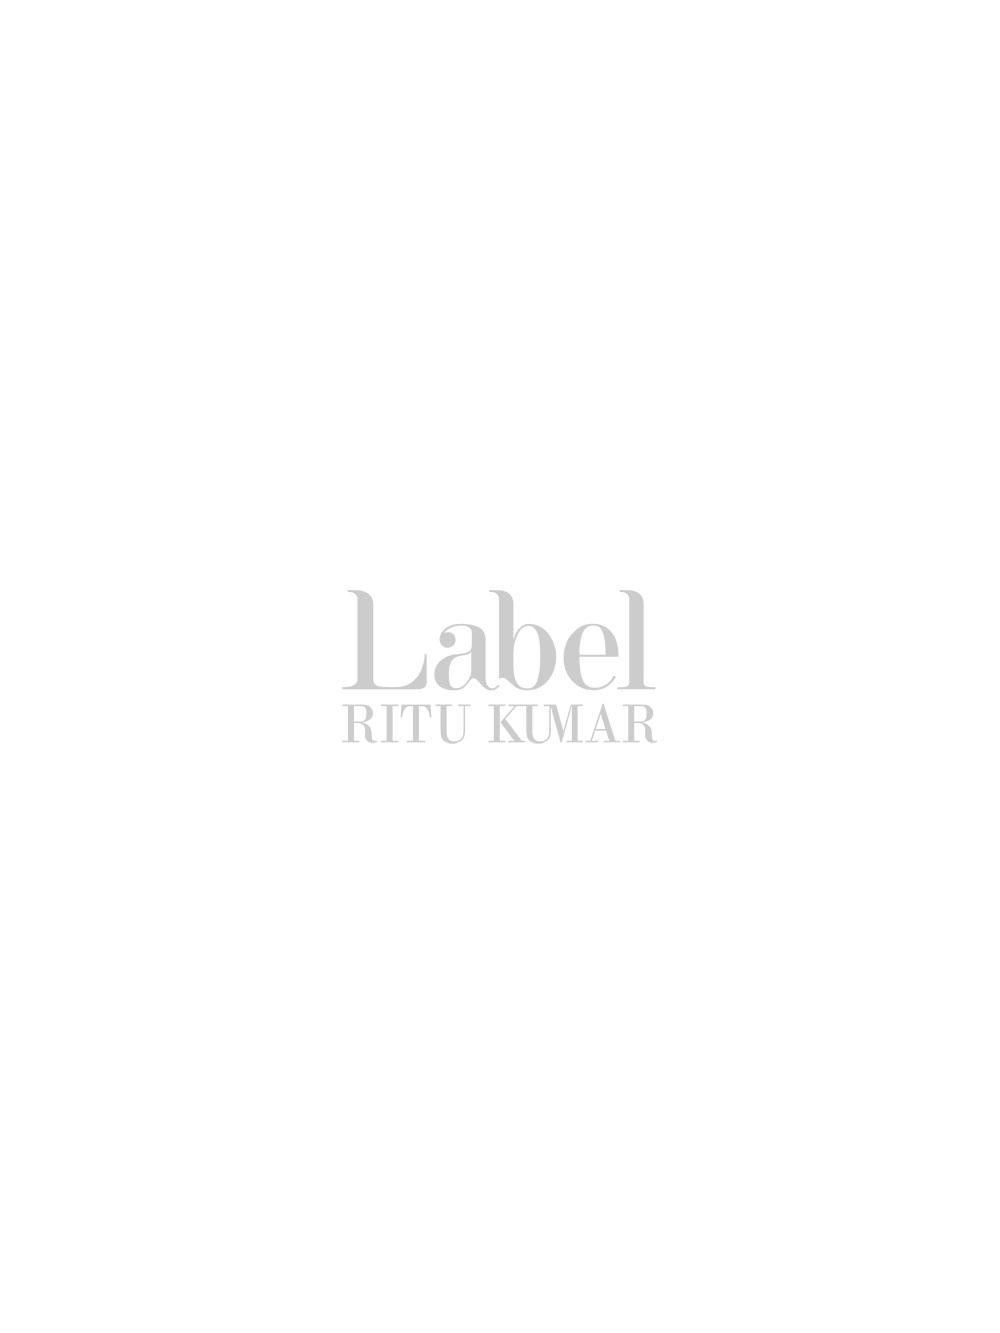 Collared Print Top by label ritu kumar